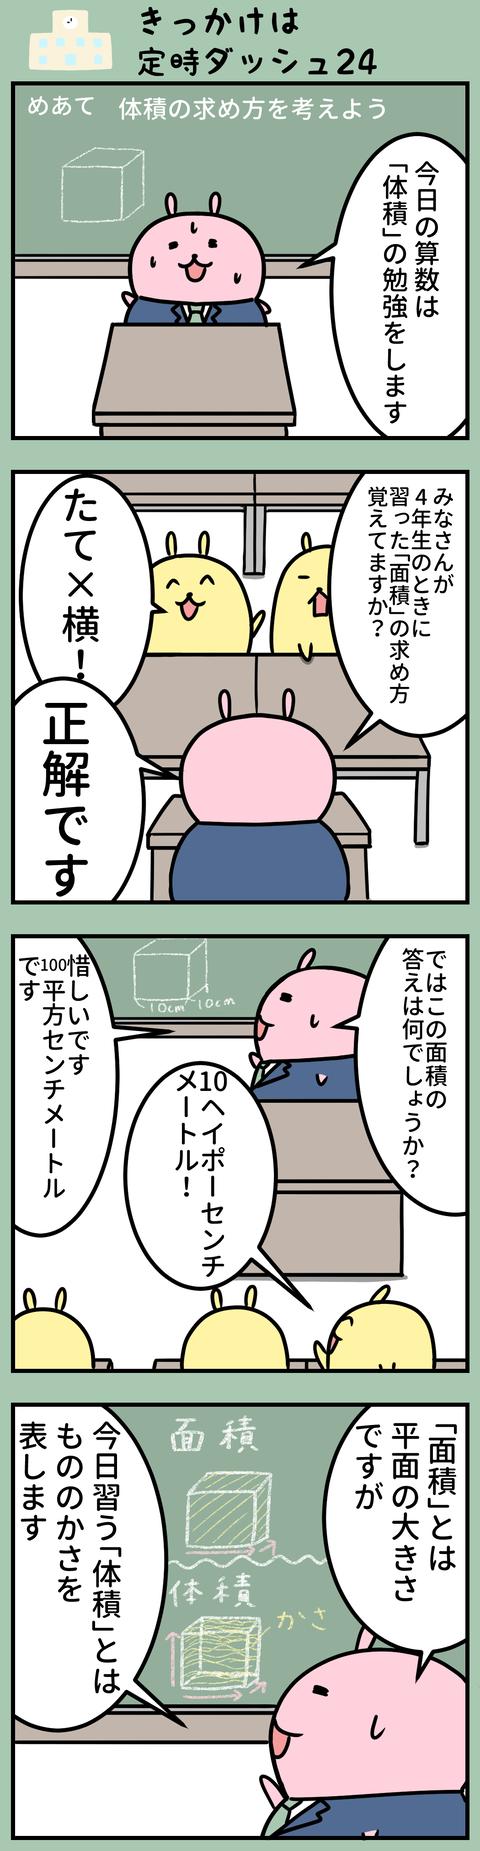 manga-yuzuporo82-1